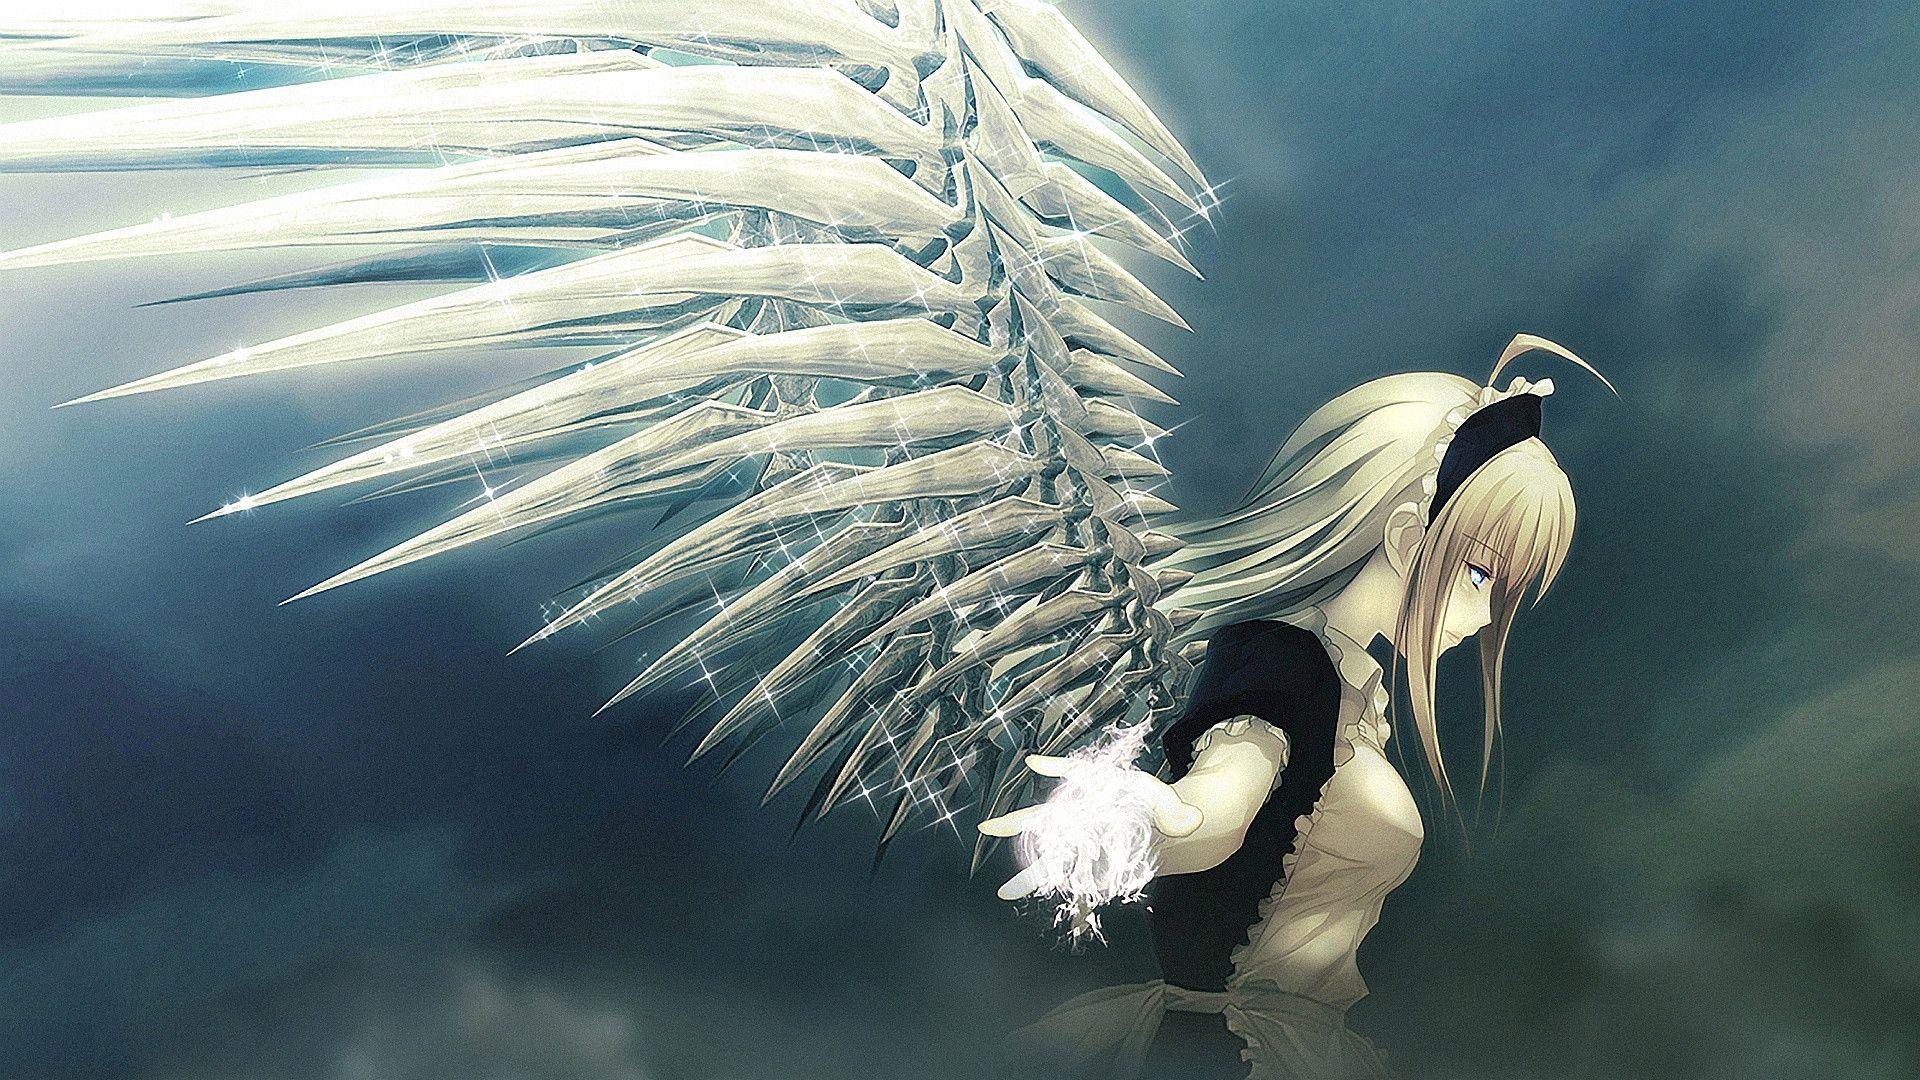 Anime Angel Wallpaper Images ~ Sdeerwallpaper